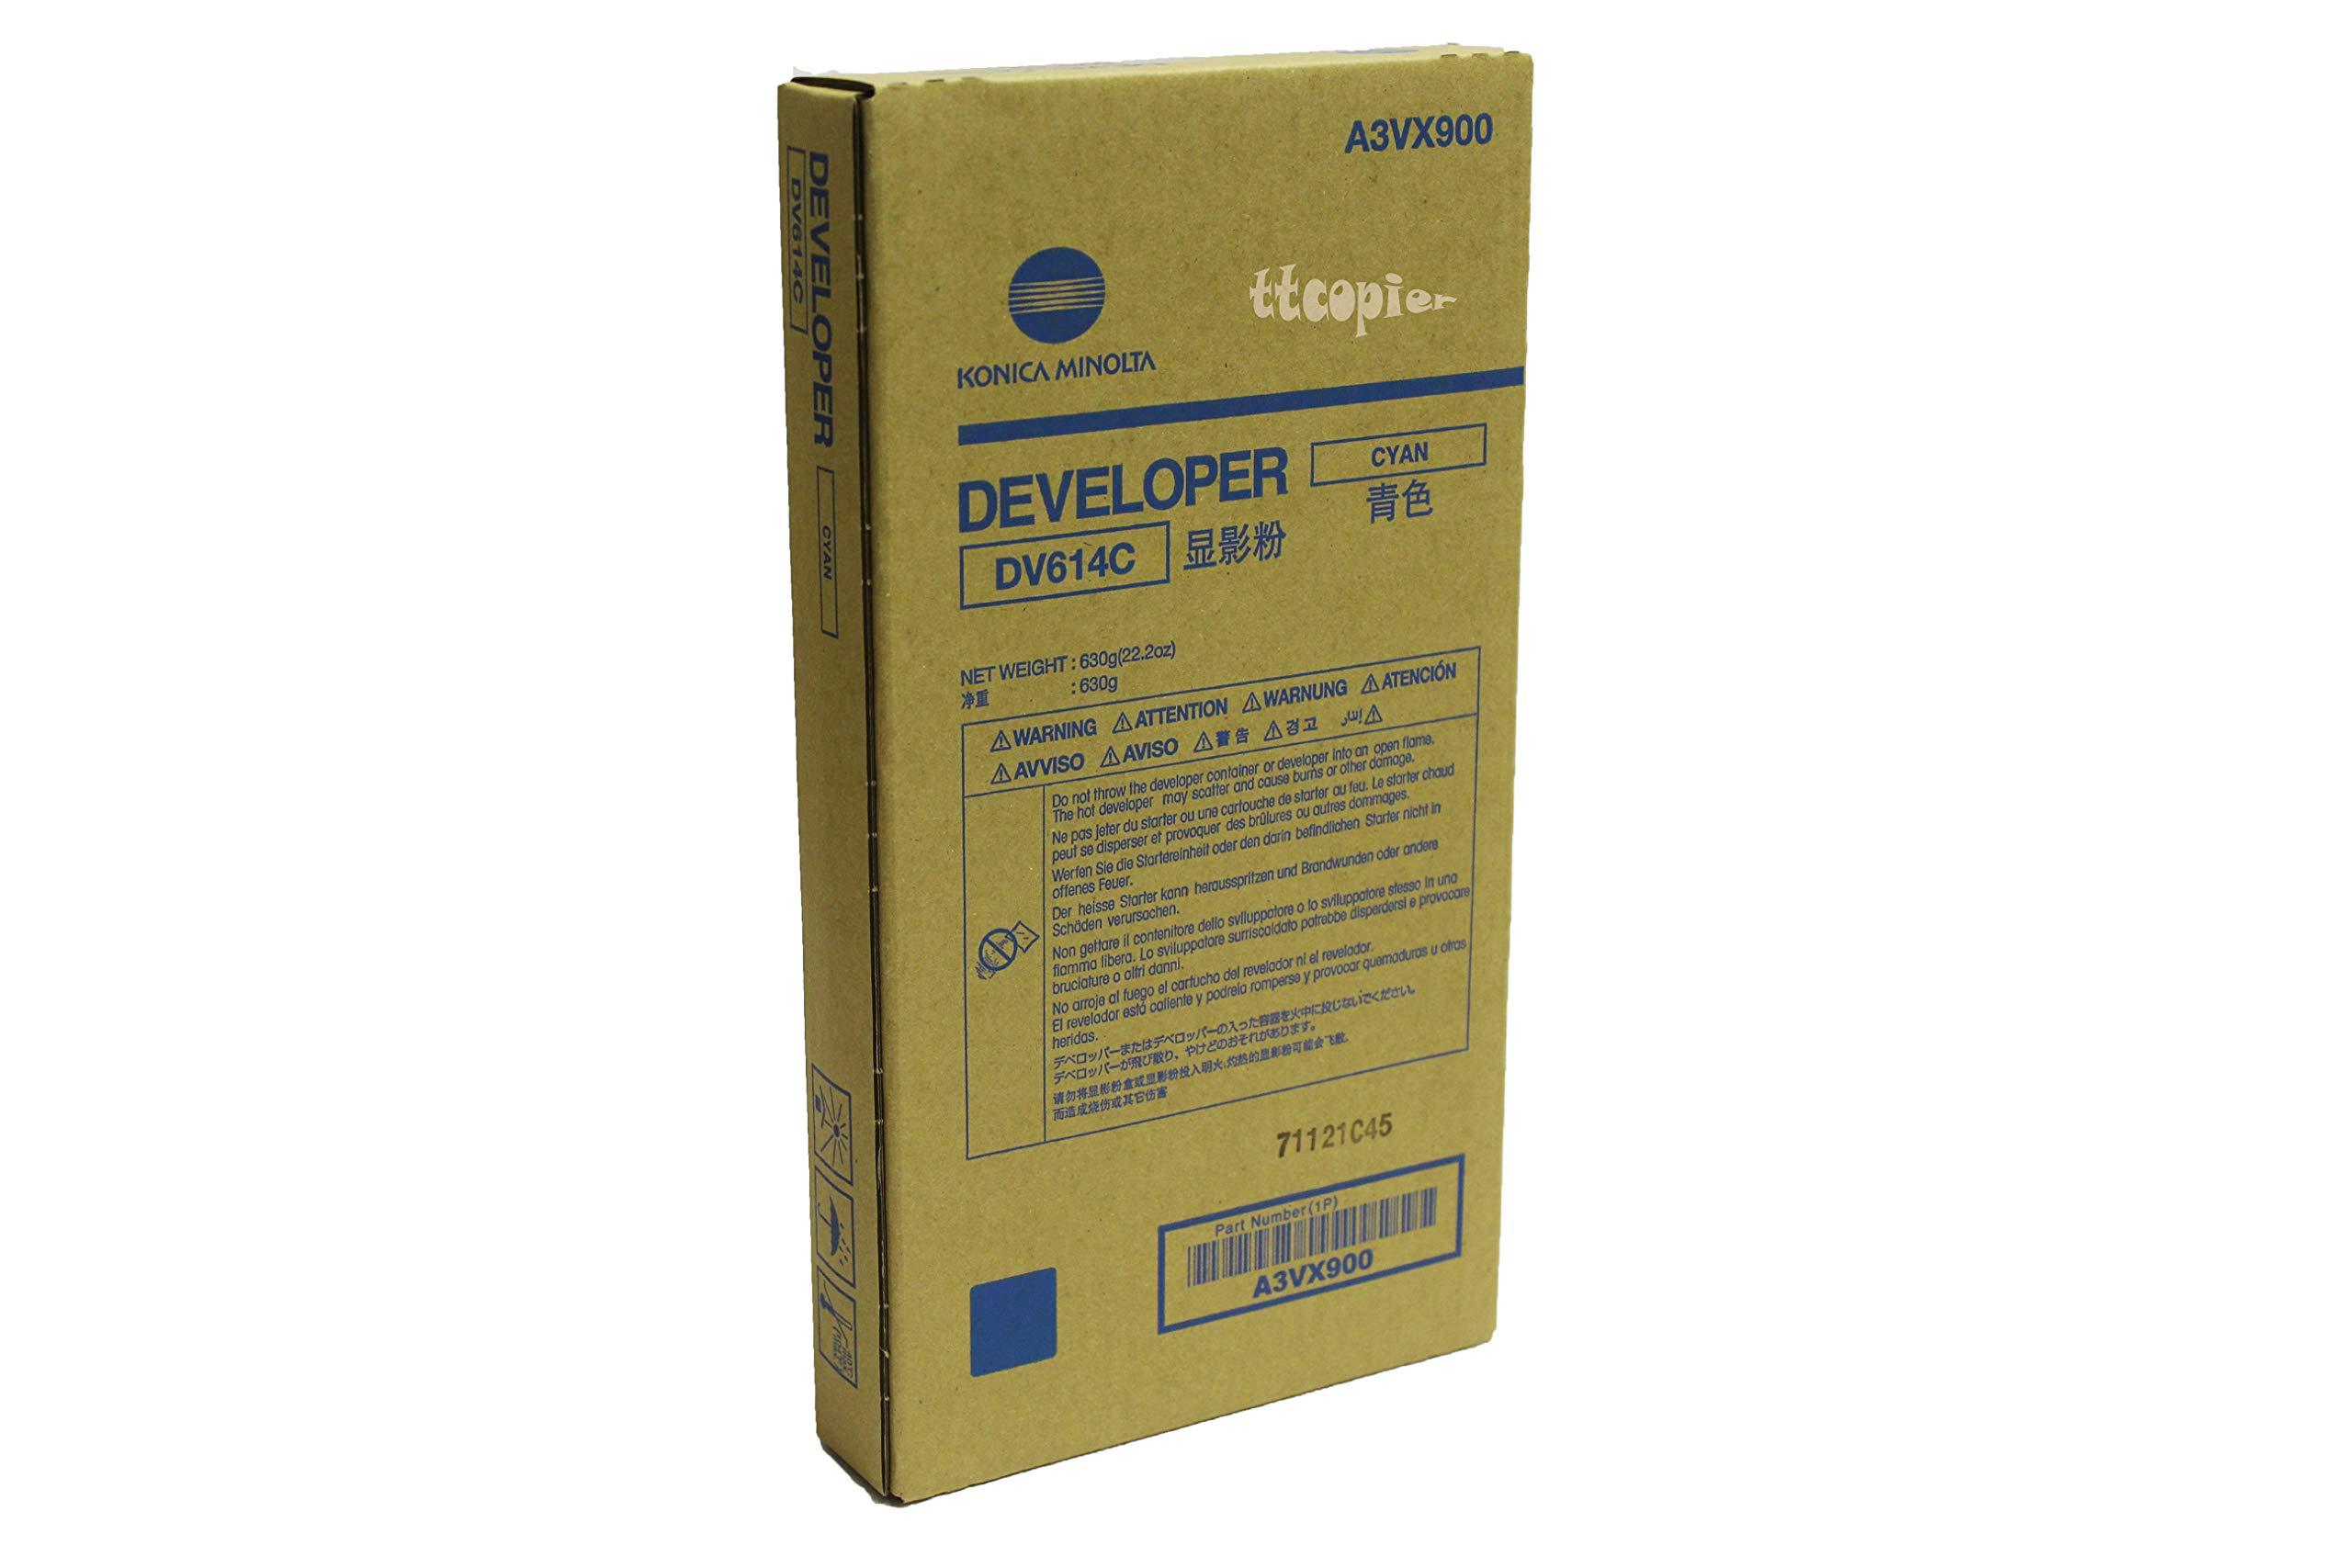 Genuine Konica Minolta A3VX900 DV614C Cyan Developer for C1060 C1070 by Konica-Minolta (Image #1)